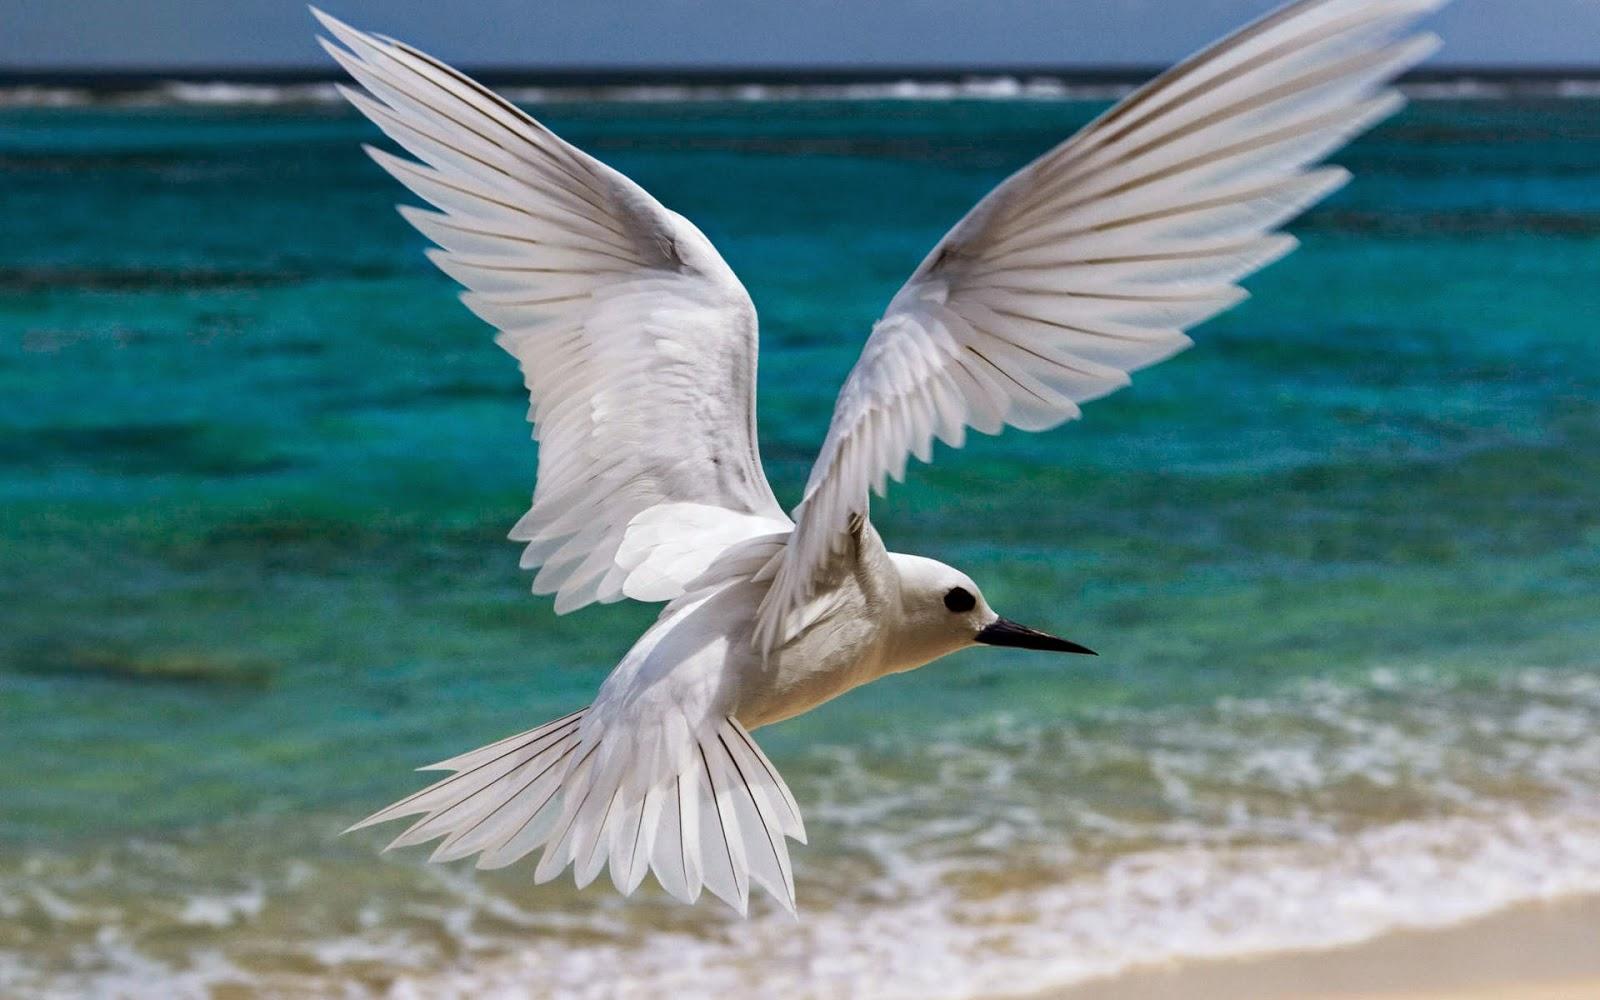 Beautiful And Dangerous Animals Birds Hd Wallpapers